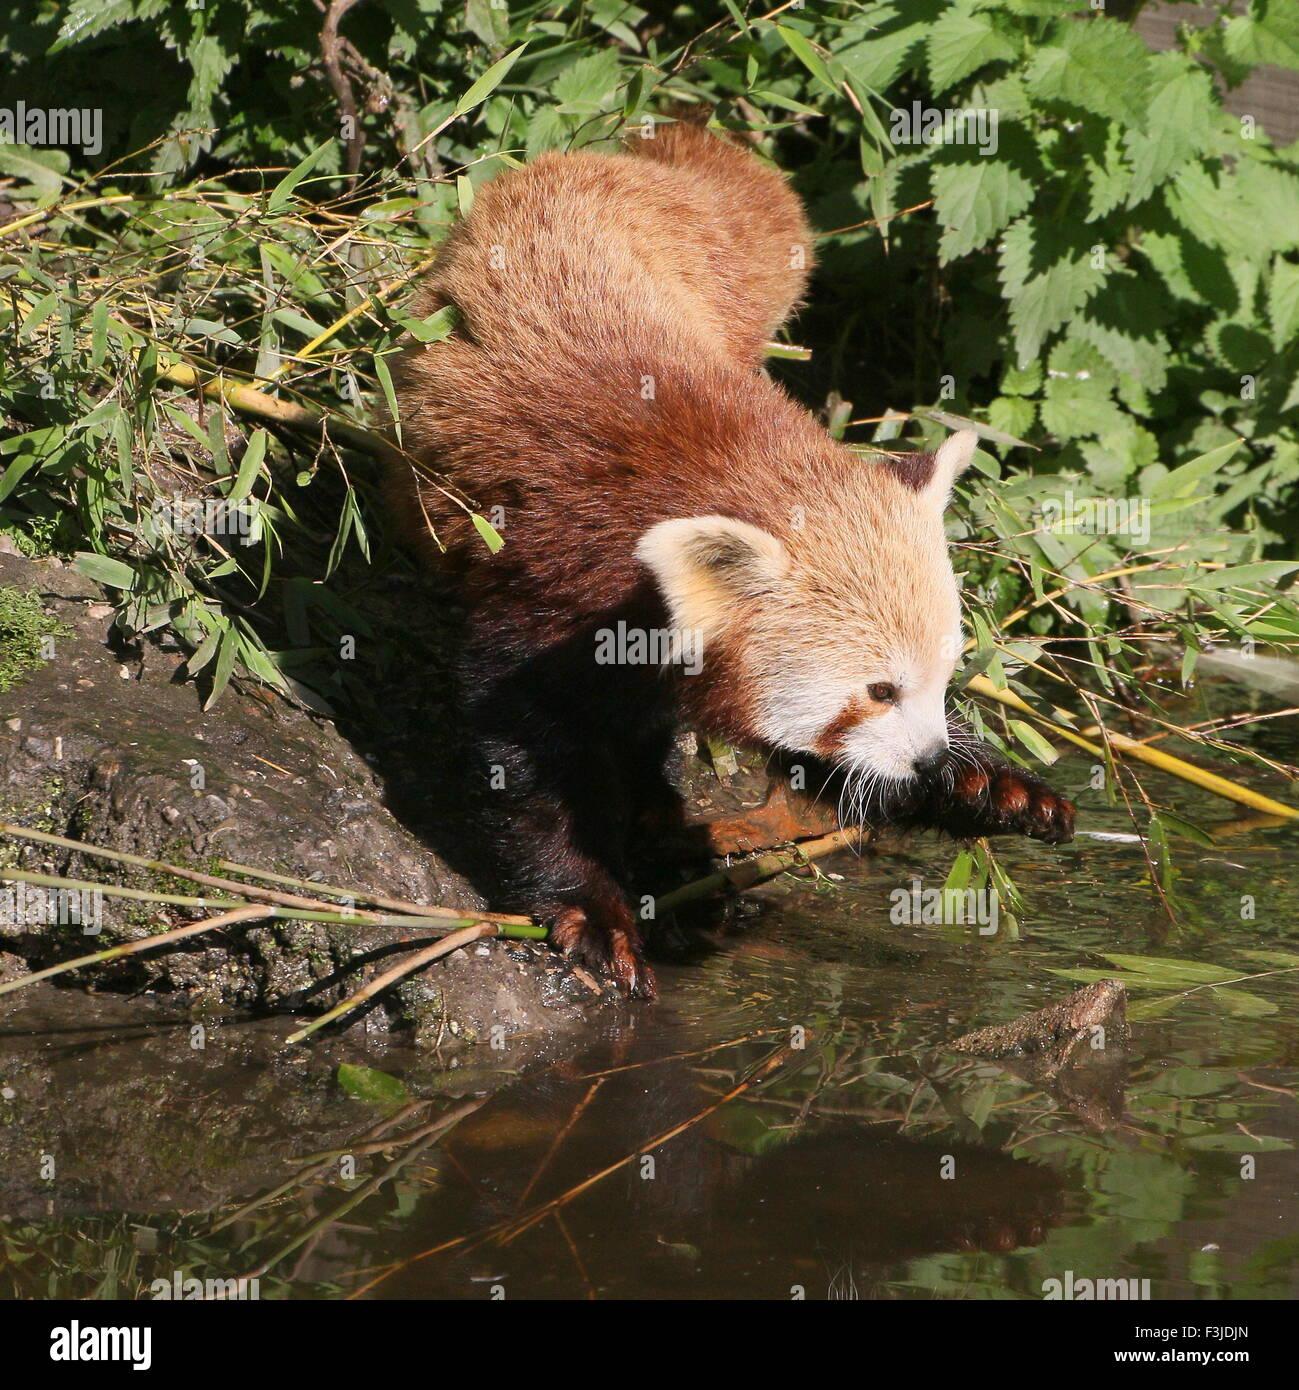 Asian Red Panda (Ailurus fulgens) at the water's edge, fishing - Stock Image